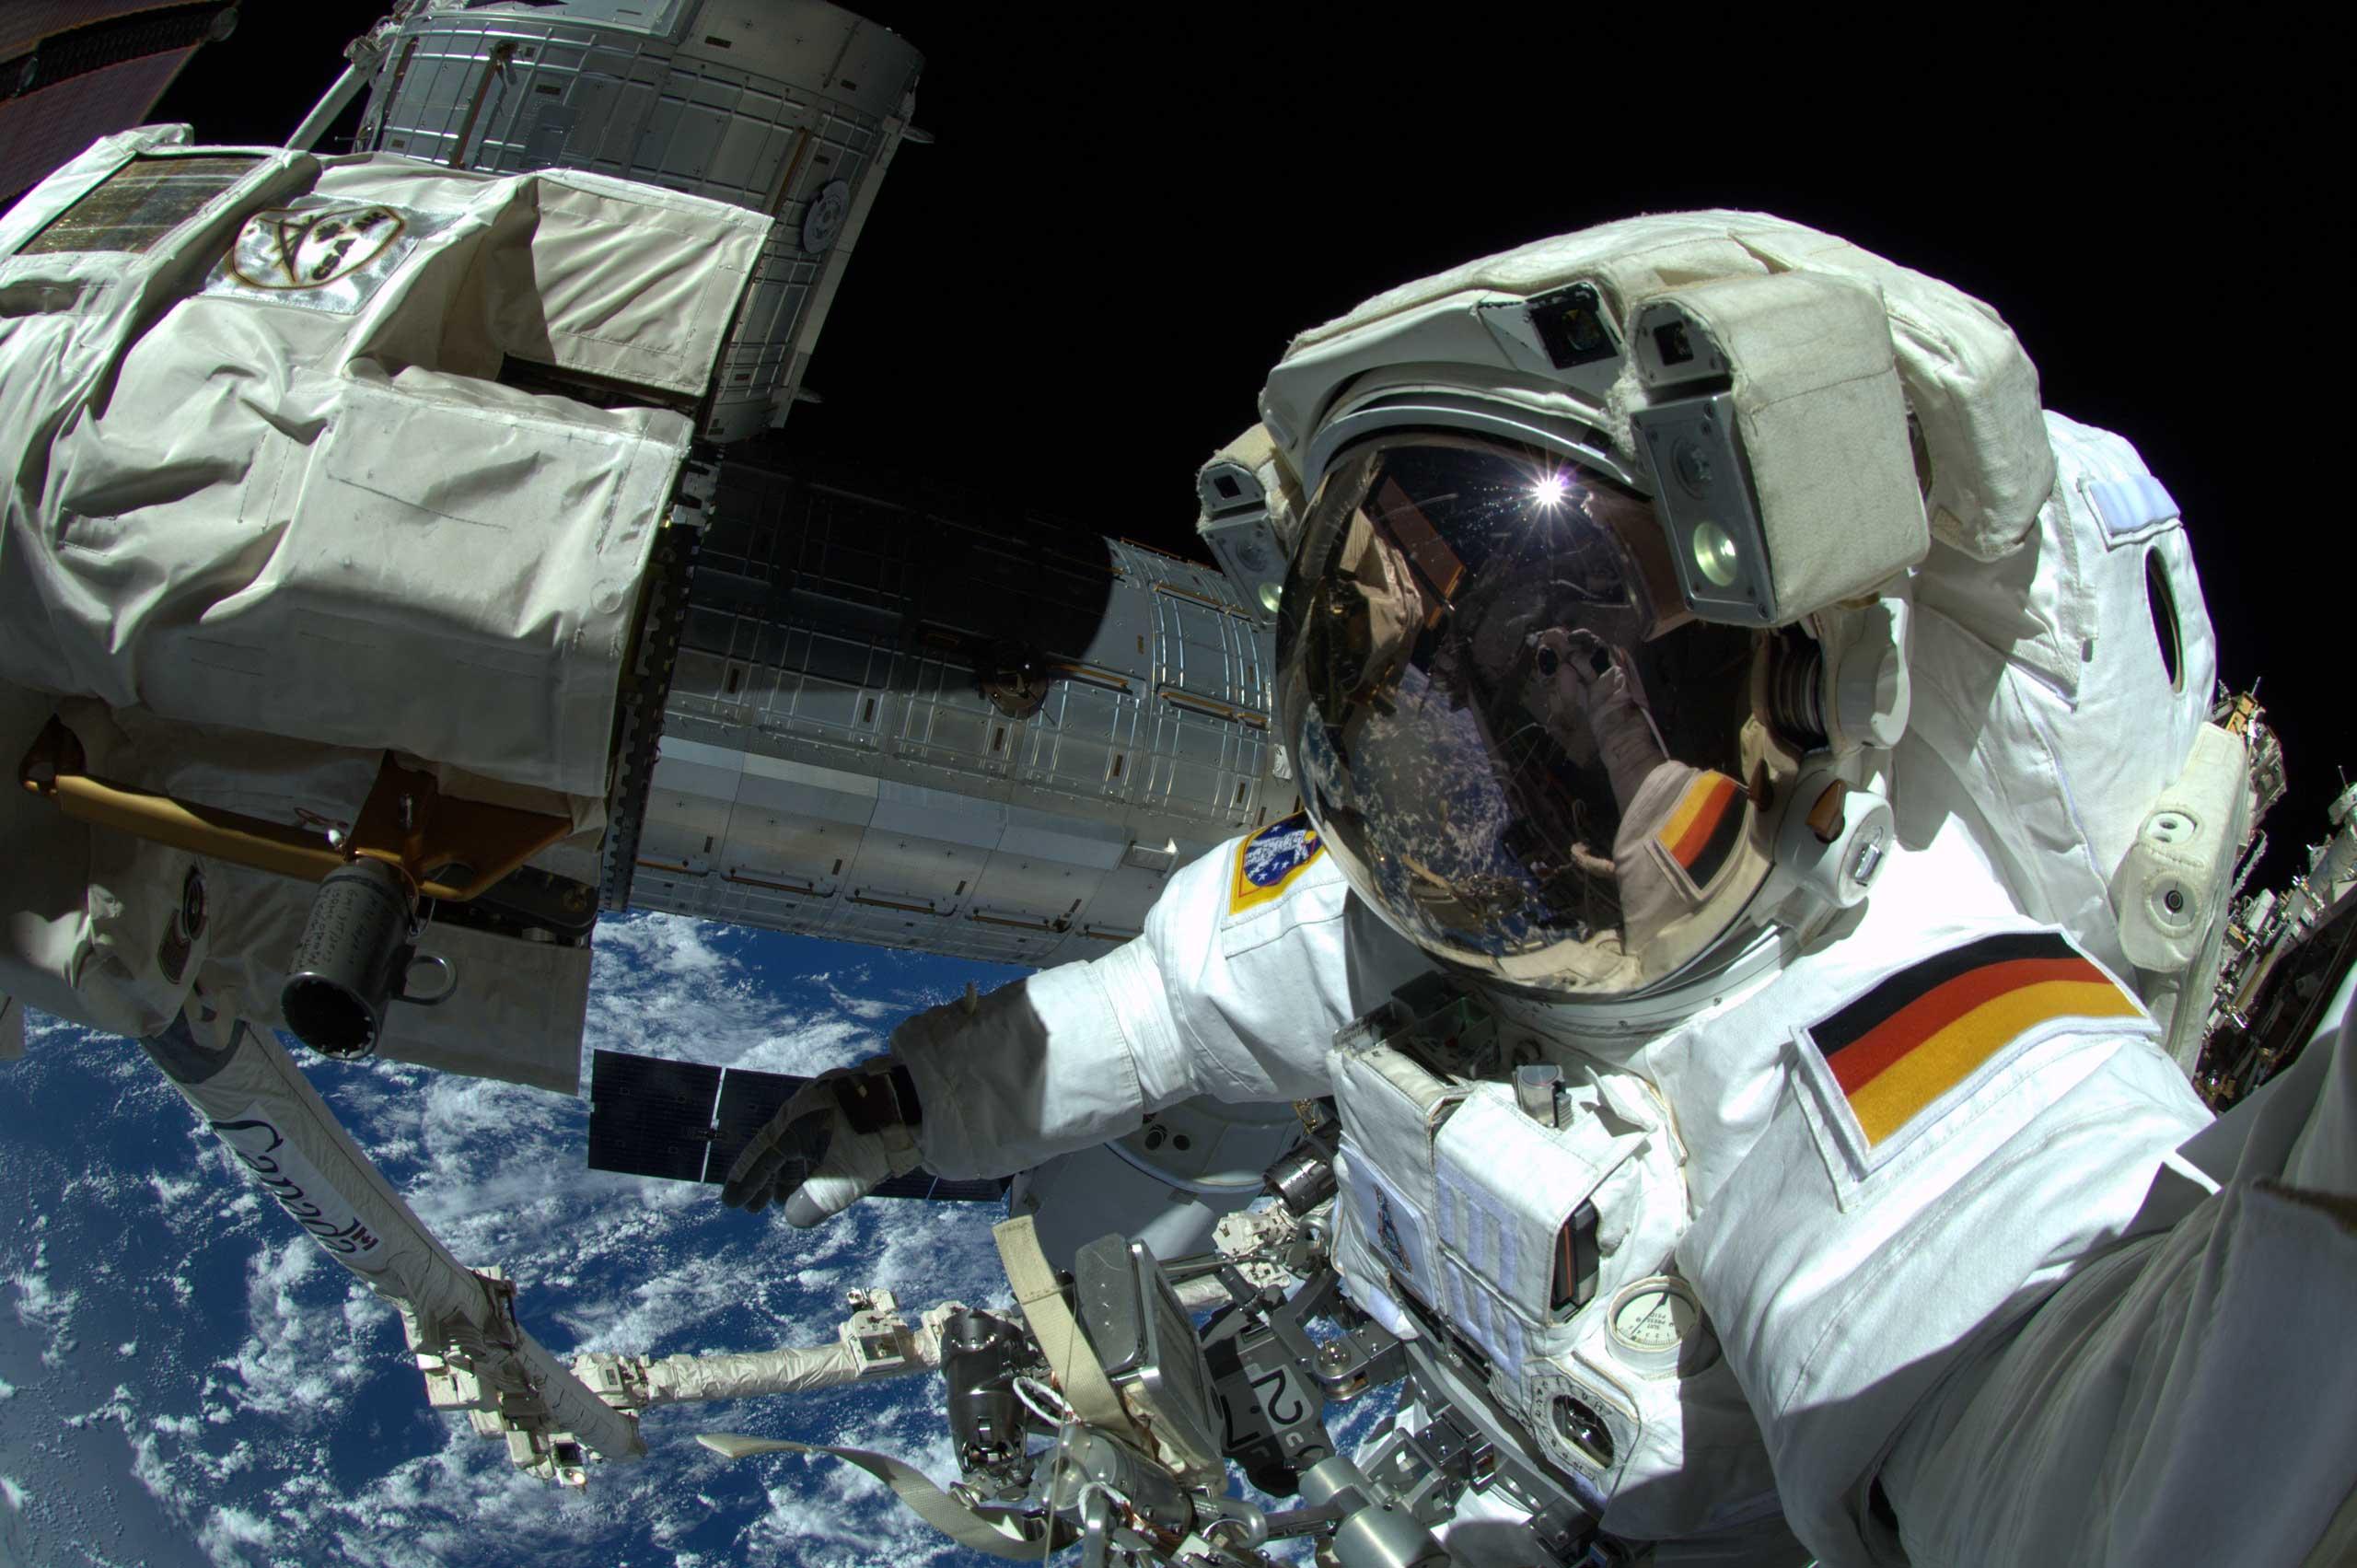 ESA Astronaut Alexander Gerst takes a selfie during a spacewalk on Oct. 7, 2014.